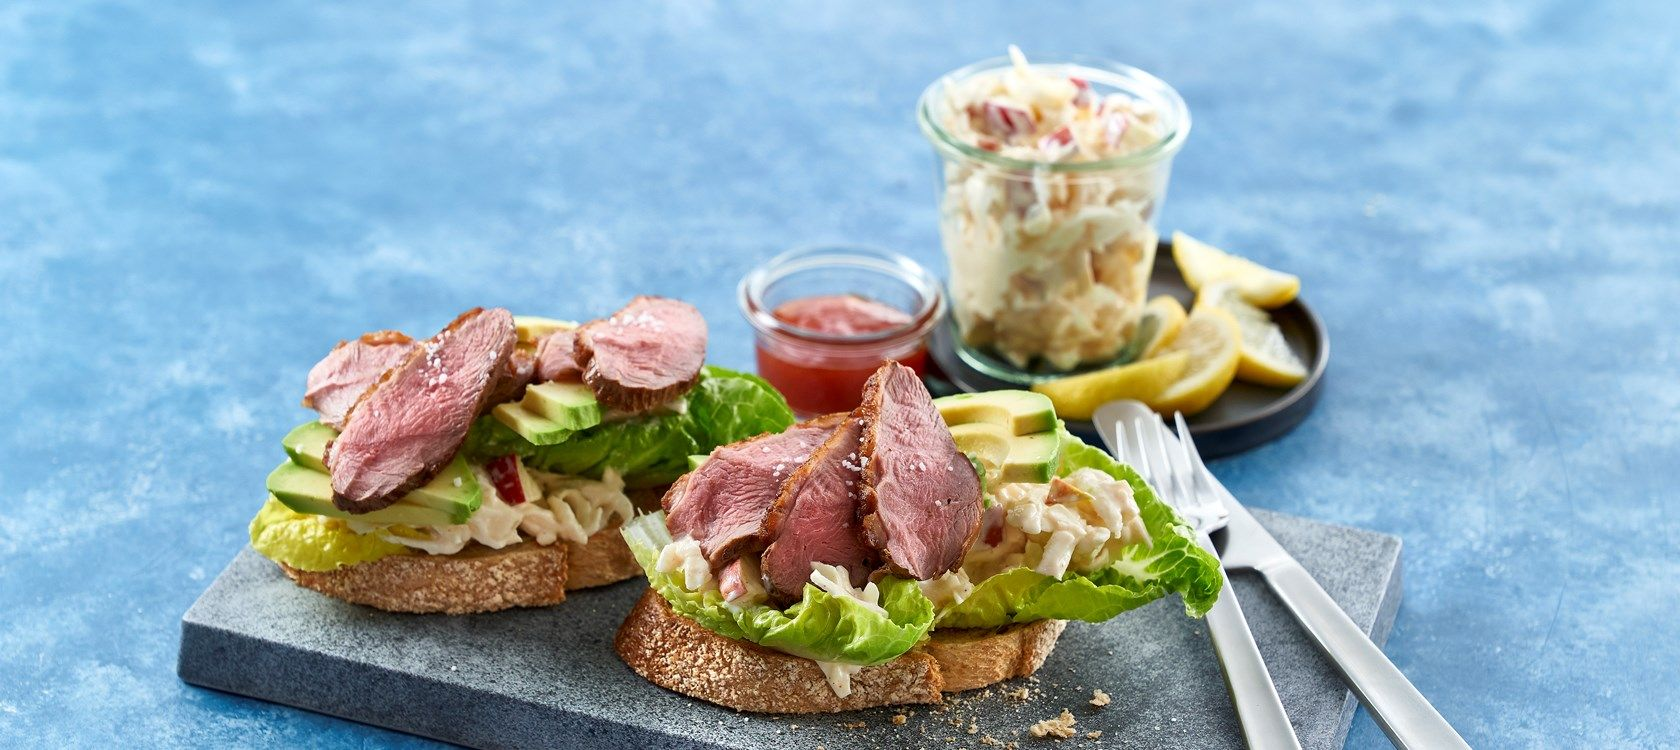 Sandwich med stegt andebryst - Få Opskriften nu på Arla.dk